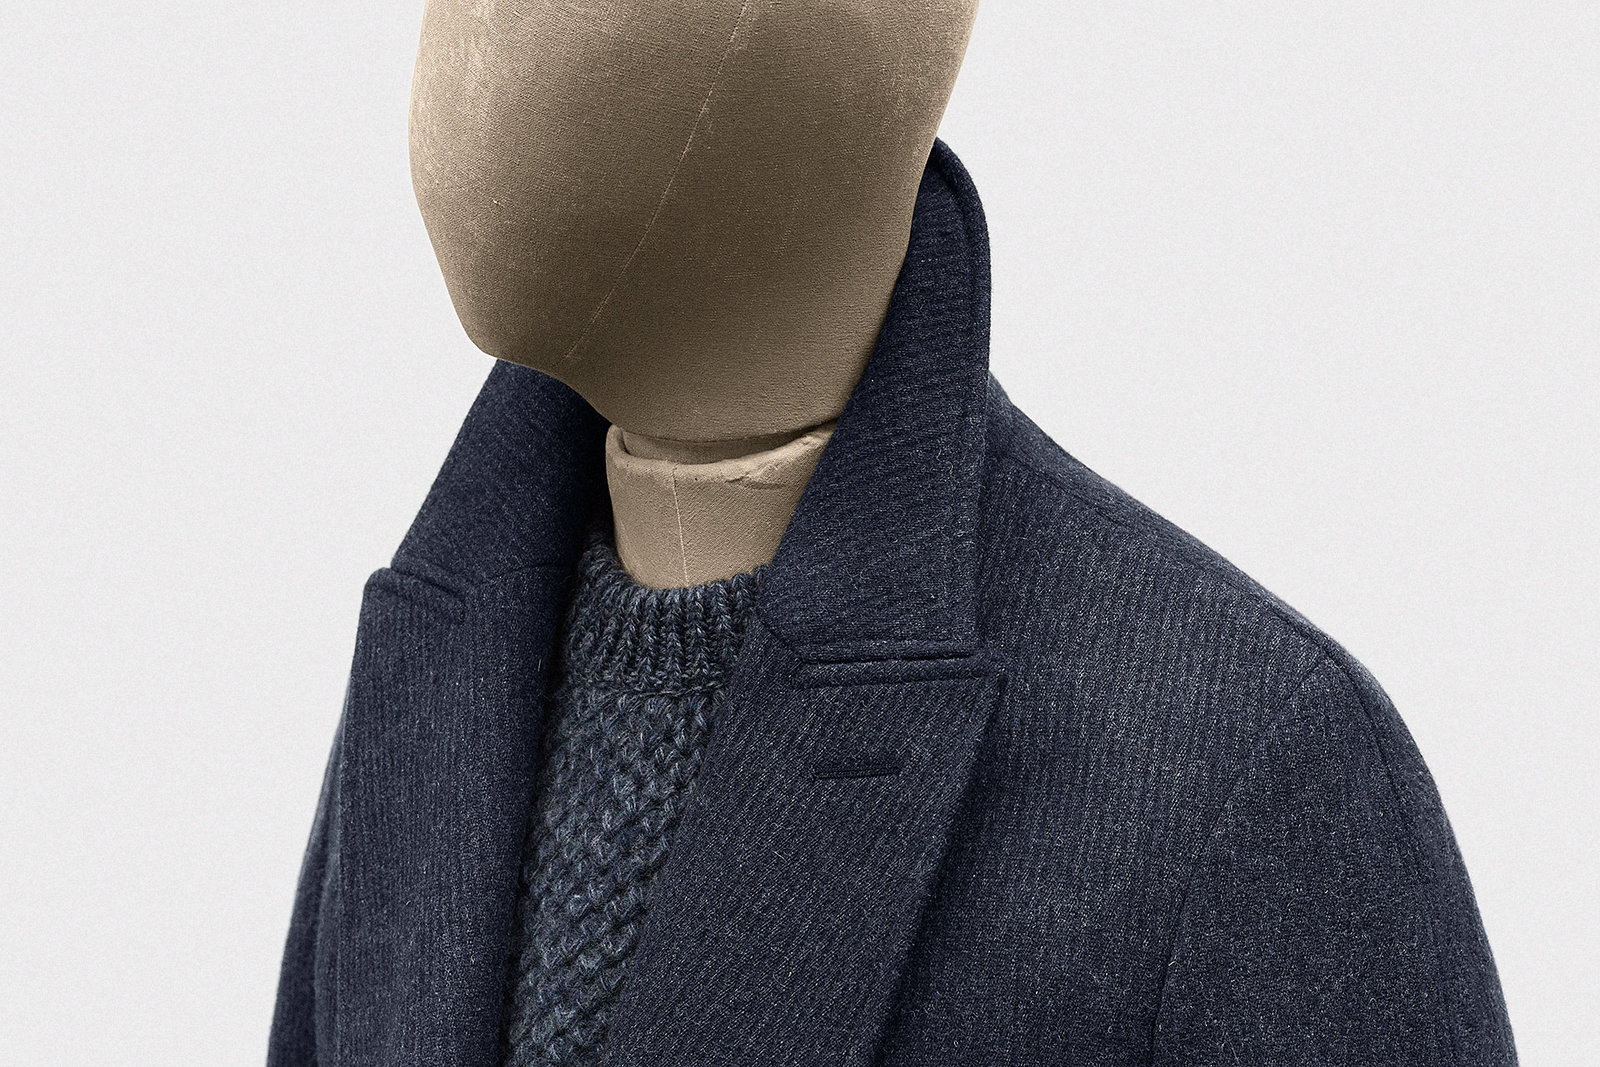 tielocken-woollen-bedford-cord-imperial-blue-4@2x.jpg